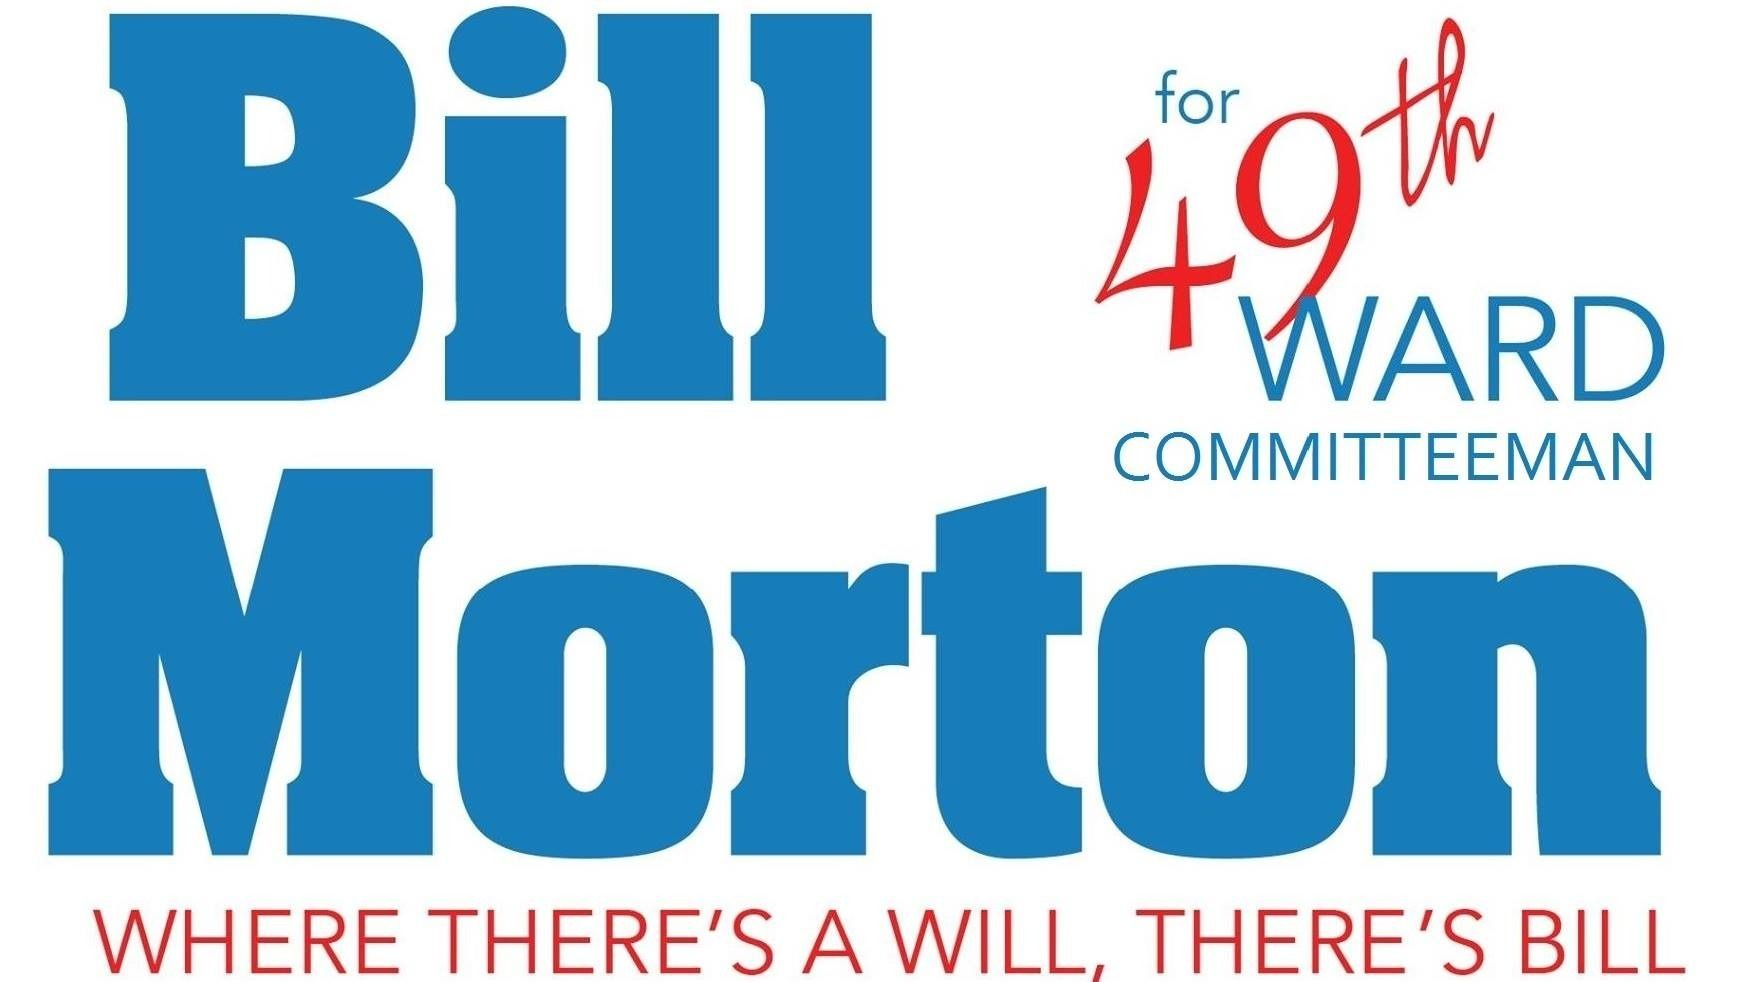 Bill Morton for 49th Ward Committeeman